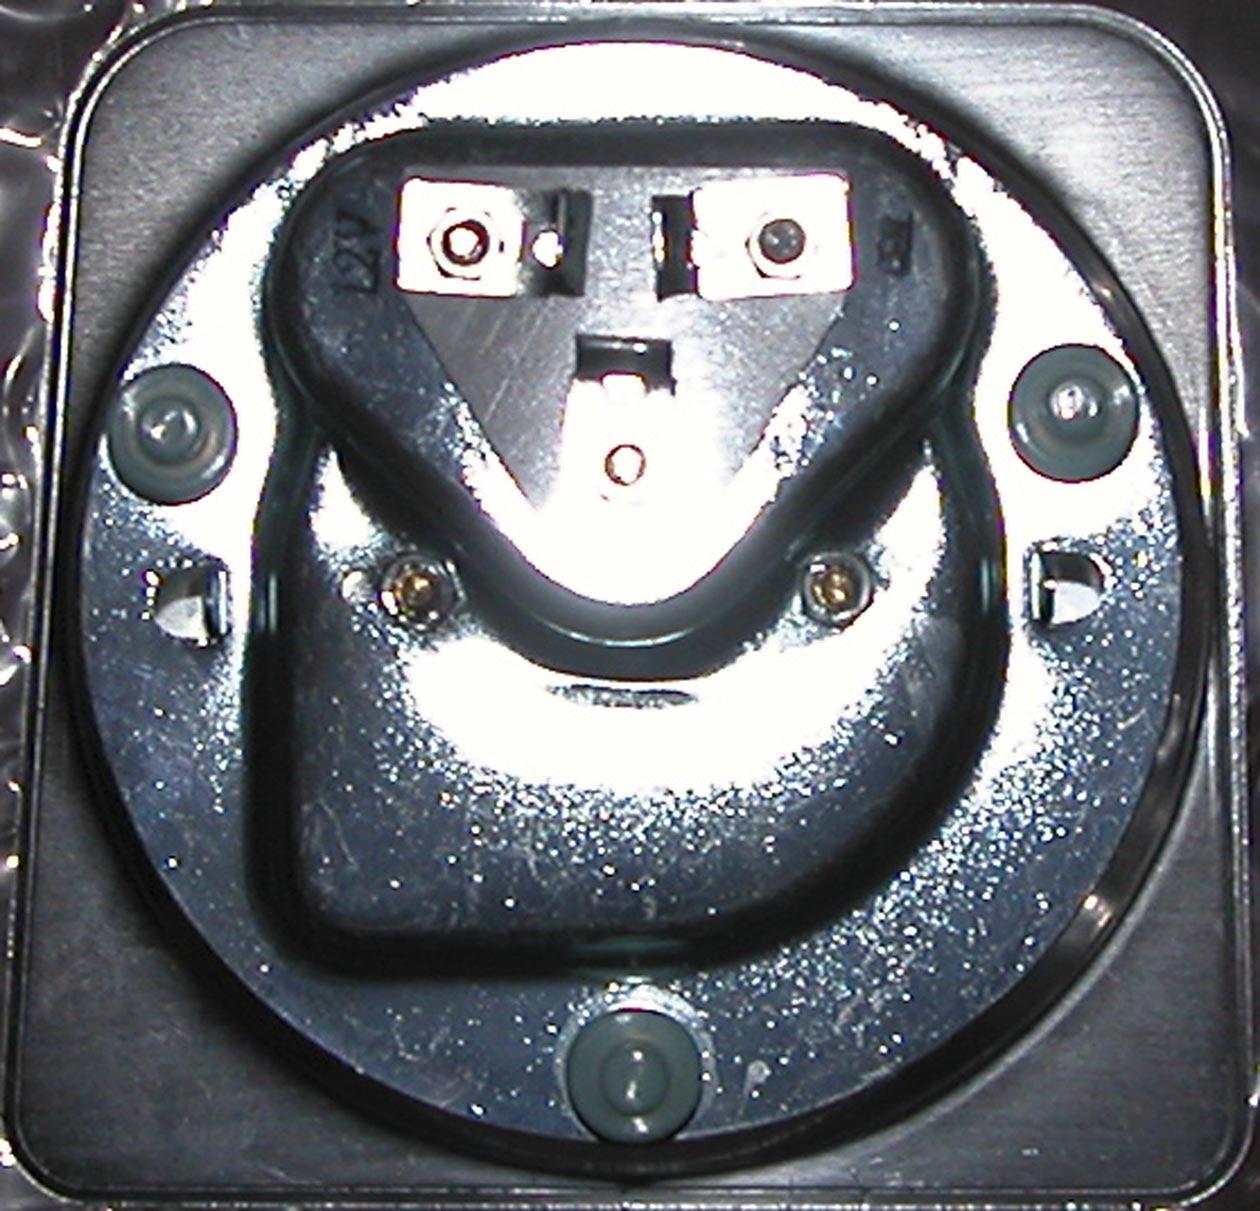 69 Camaro Tachometer Wiring Harness Wiring Diagram Multimedia Multimedia Wallabyviaggi It